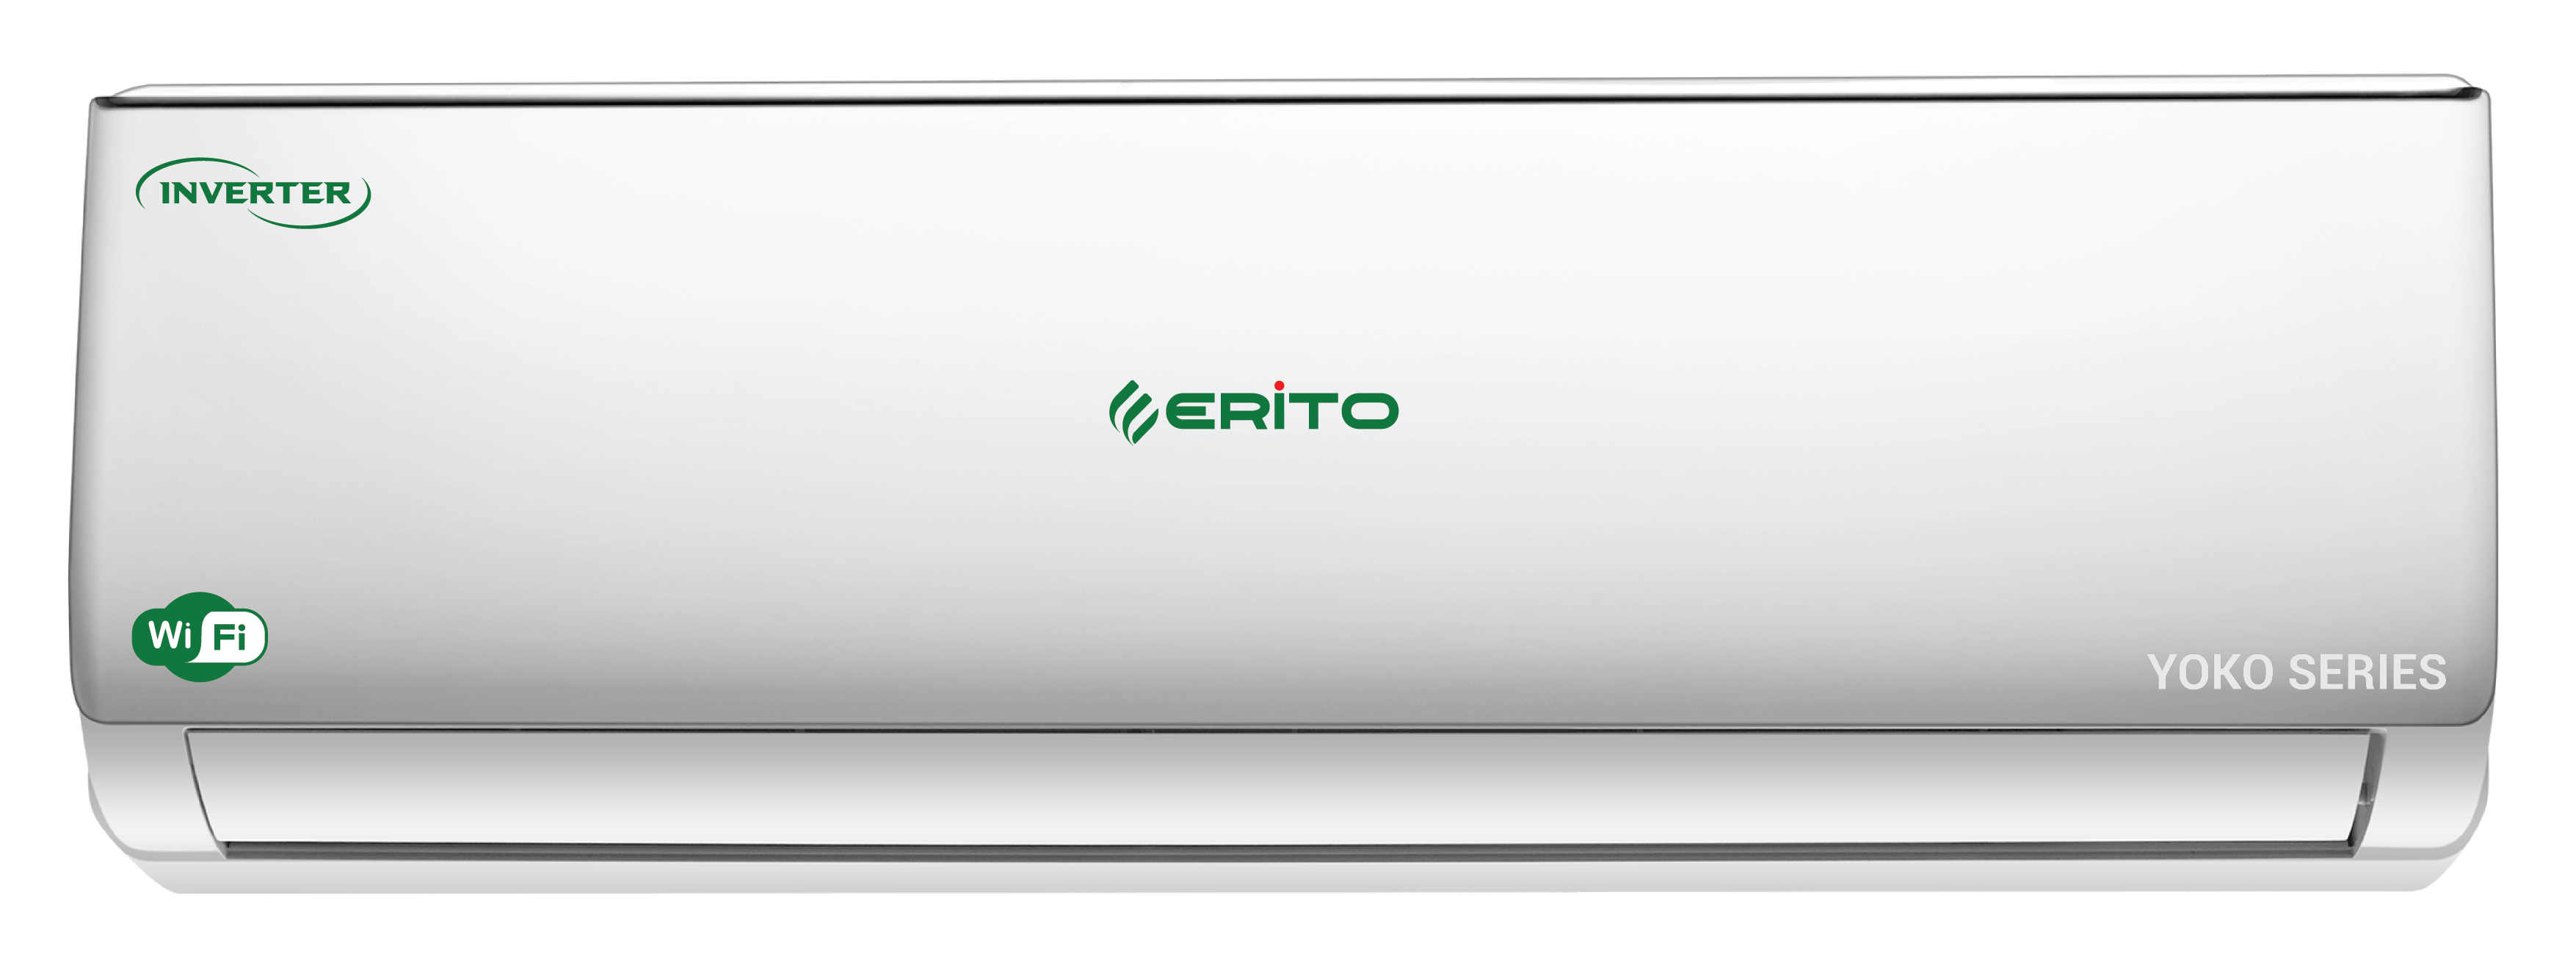 Điều hòa Yoko Series 18000BTU inverter hai chiều